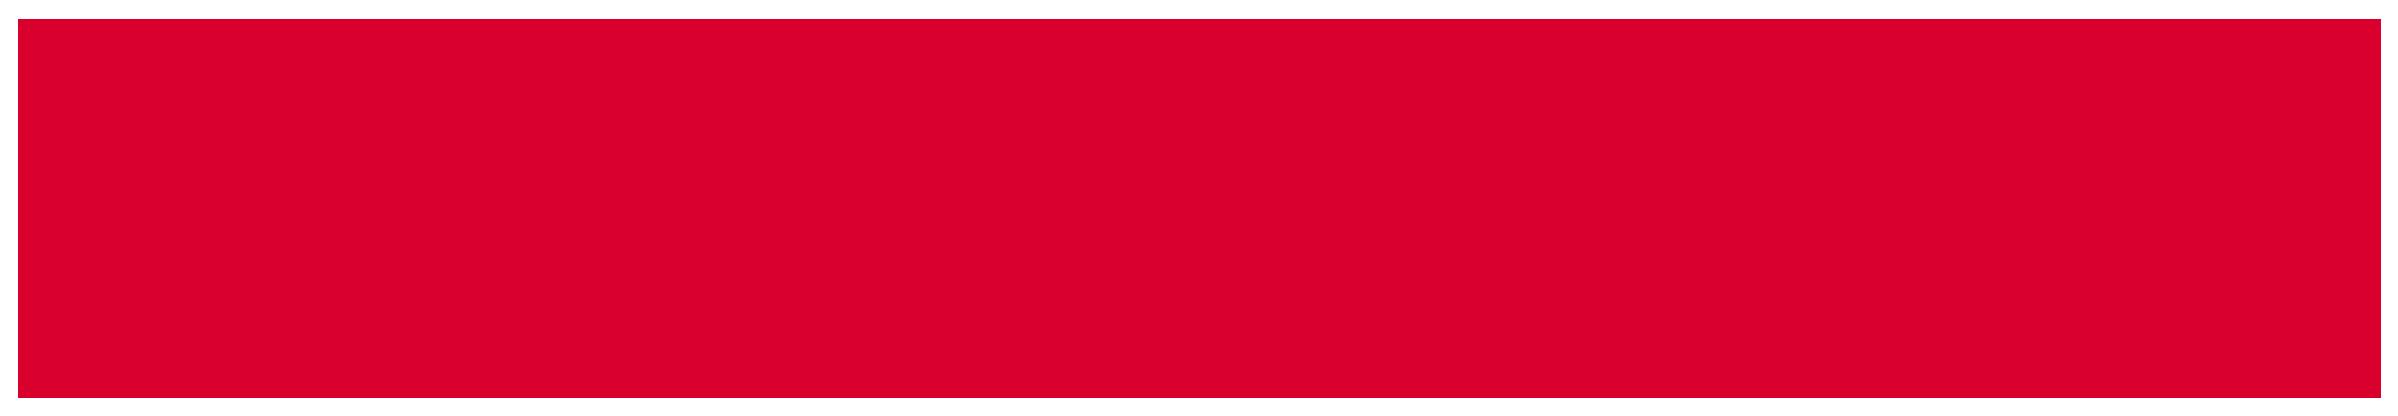 CANCOM Managed Services GmbH